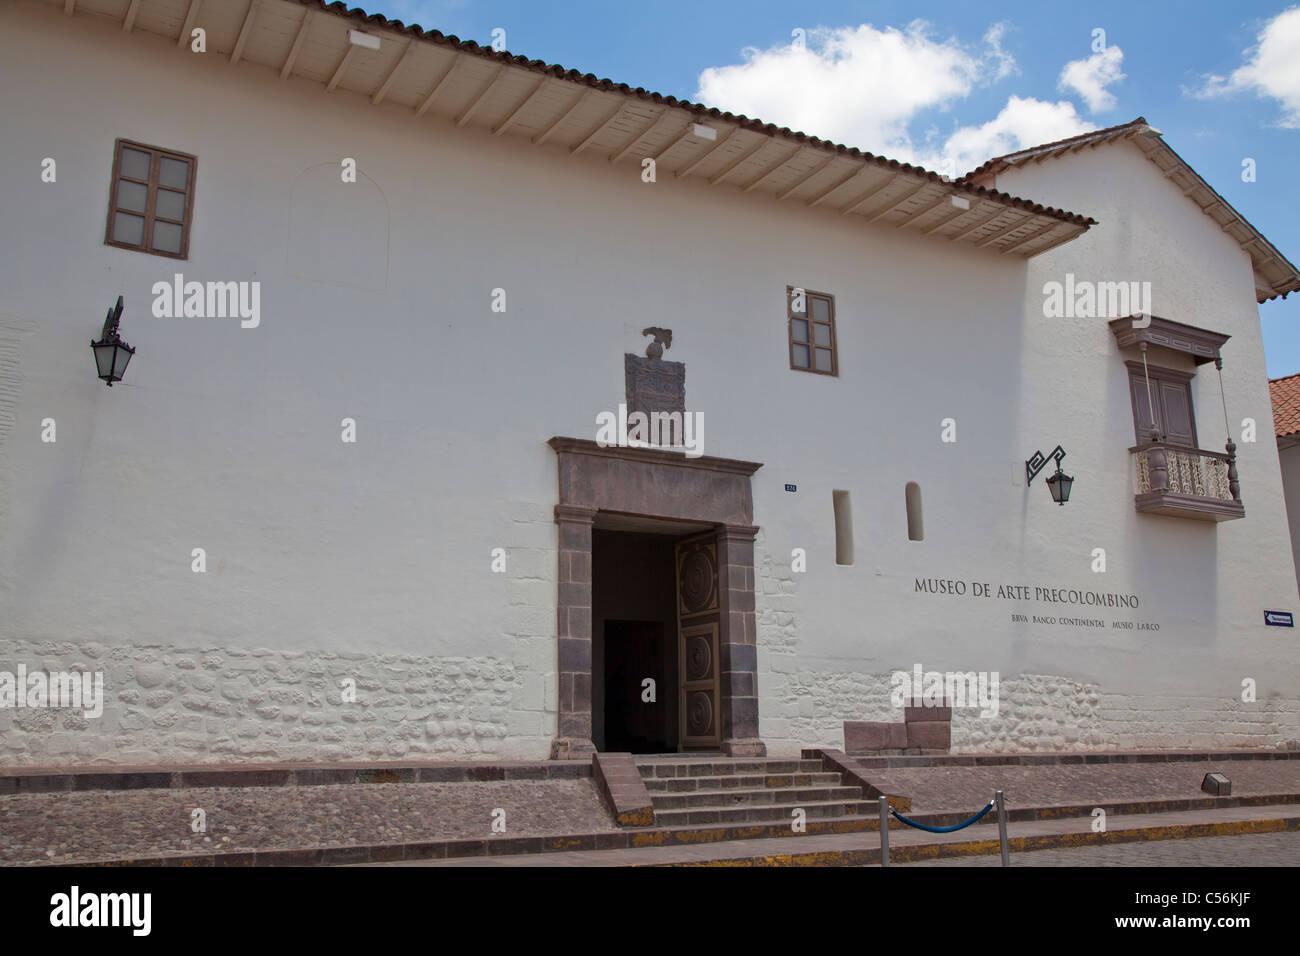 Museo de Arte Pre-Colombino (Museum of Pre-Colombian Art), Cusco, Peru - Stock Image